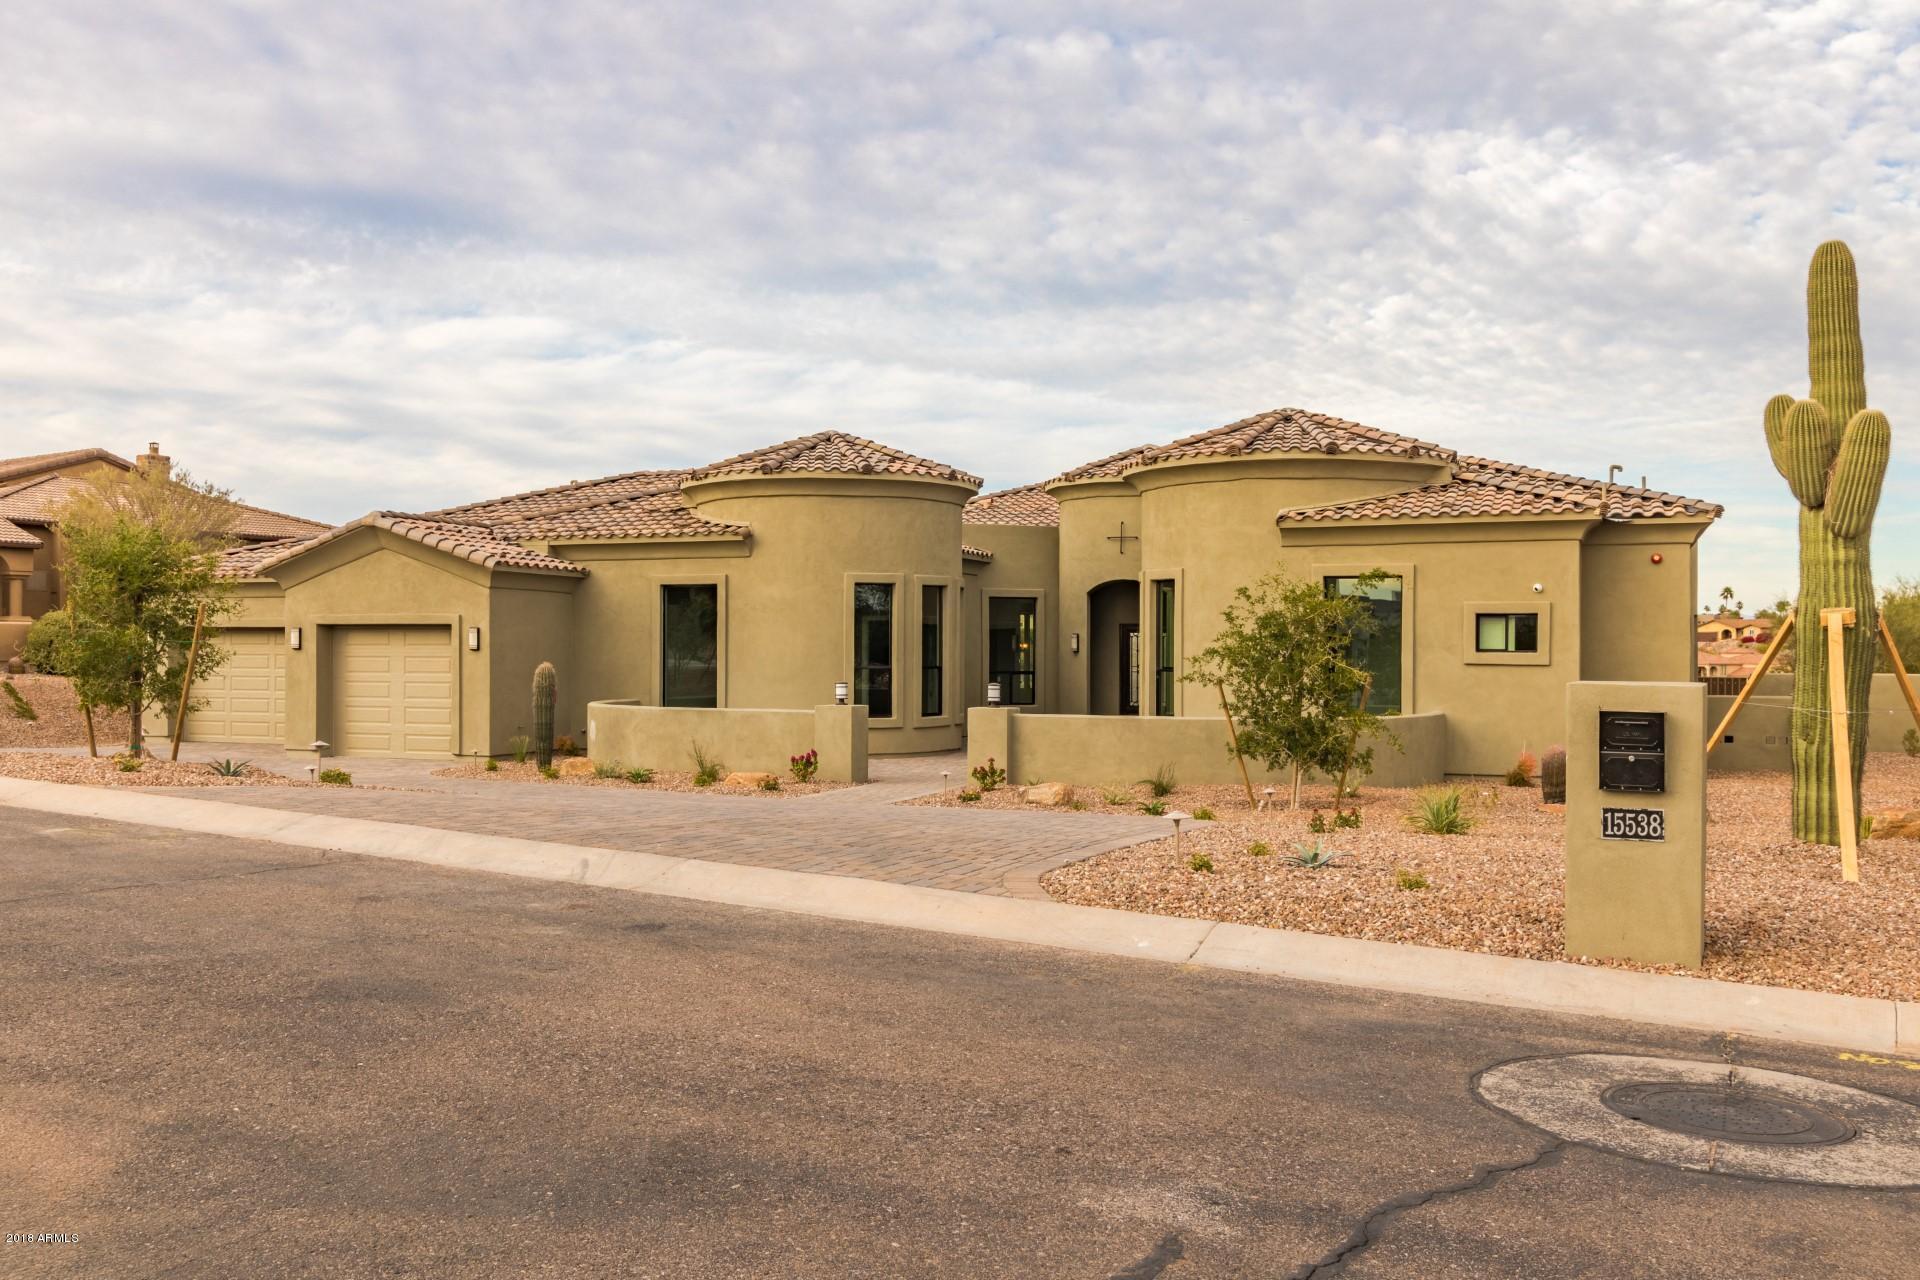 15538 E PALATIAL Drive, Fountain Hills, AZ 85268